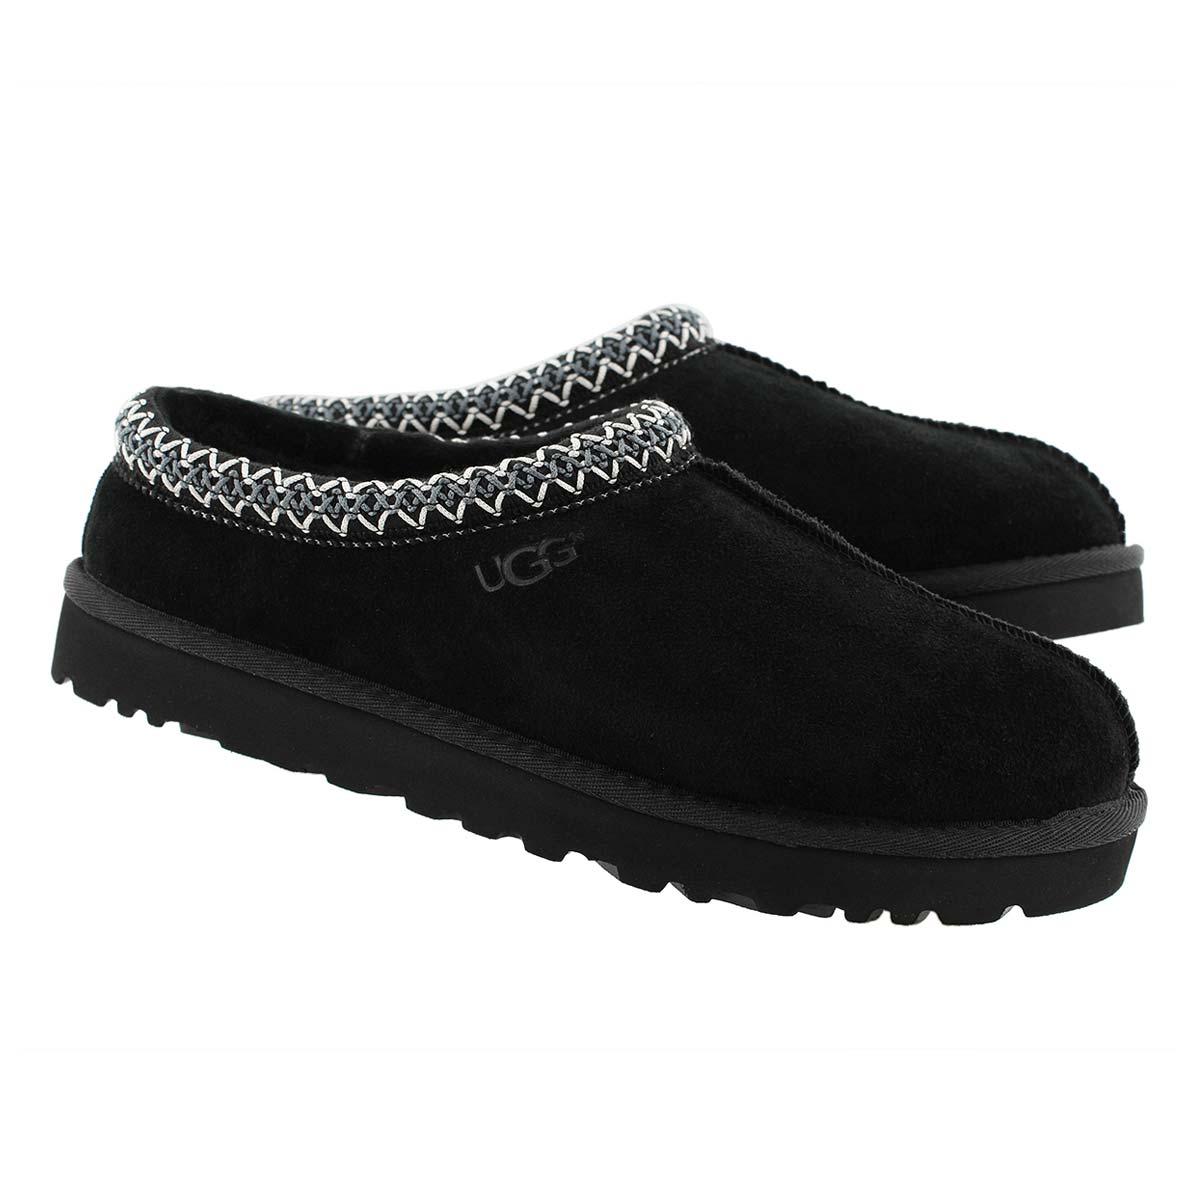 Mns Tasman black sheepskin slipper